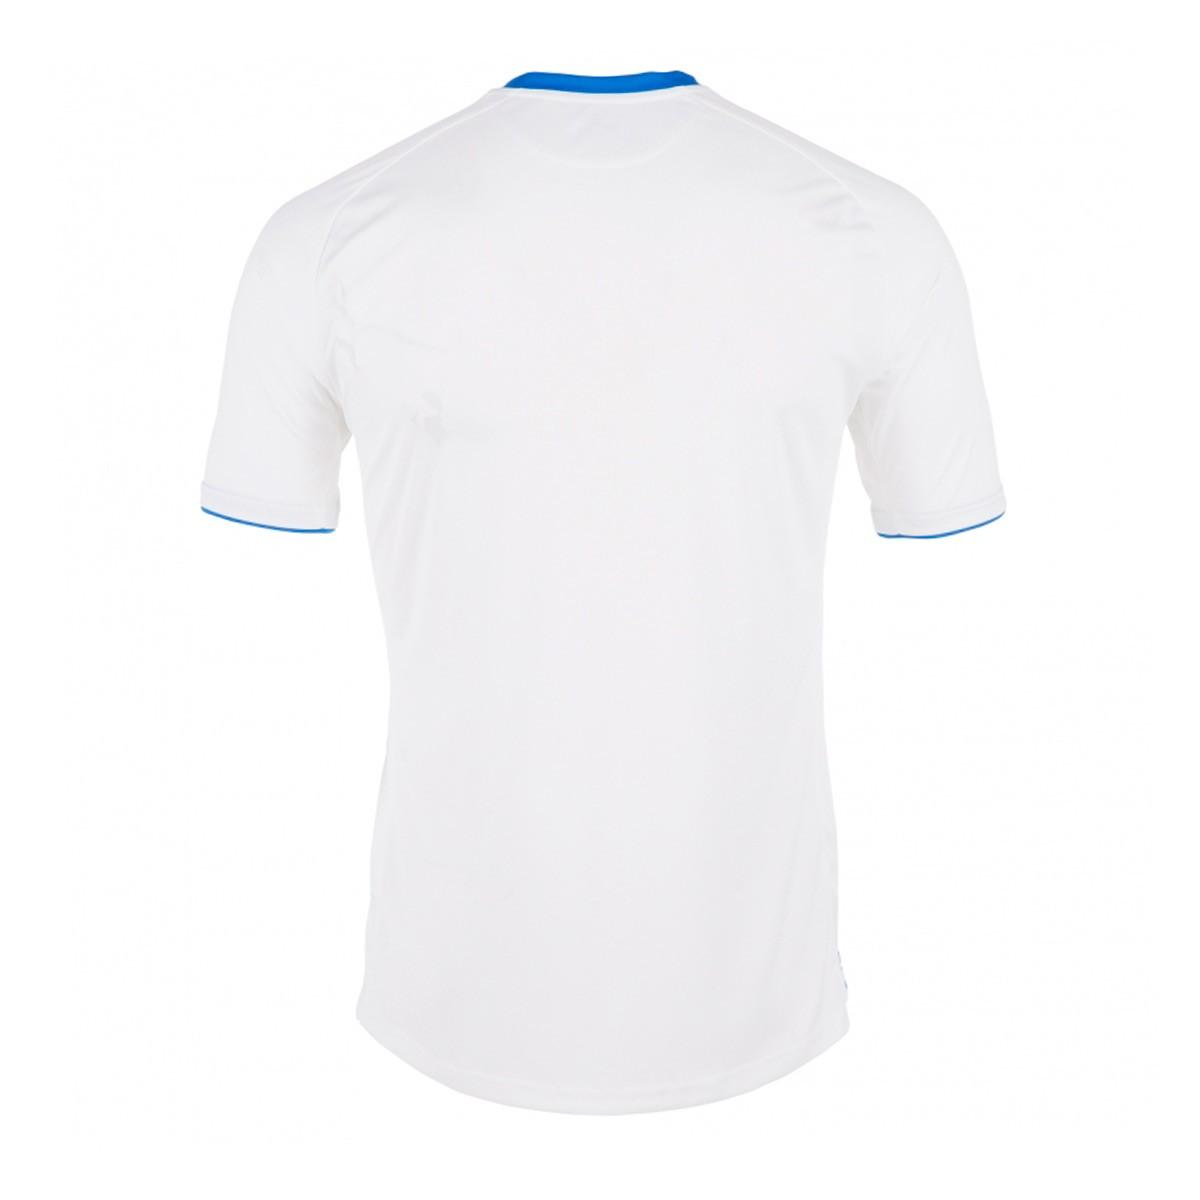 cff8cbc93ae Jersey Joma Galaxy m/c White-Royal - Tienda de fútbol Fútbol Emotion